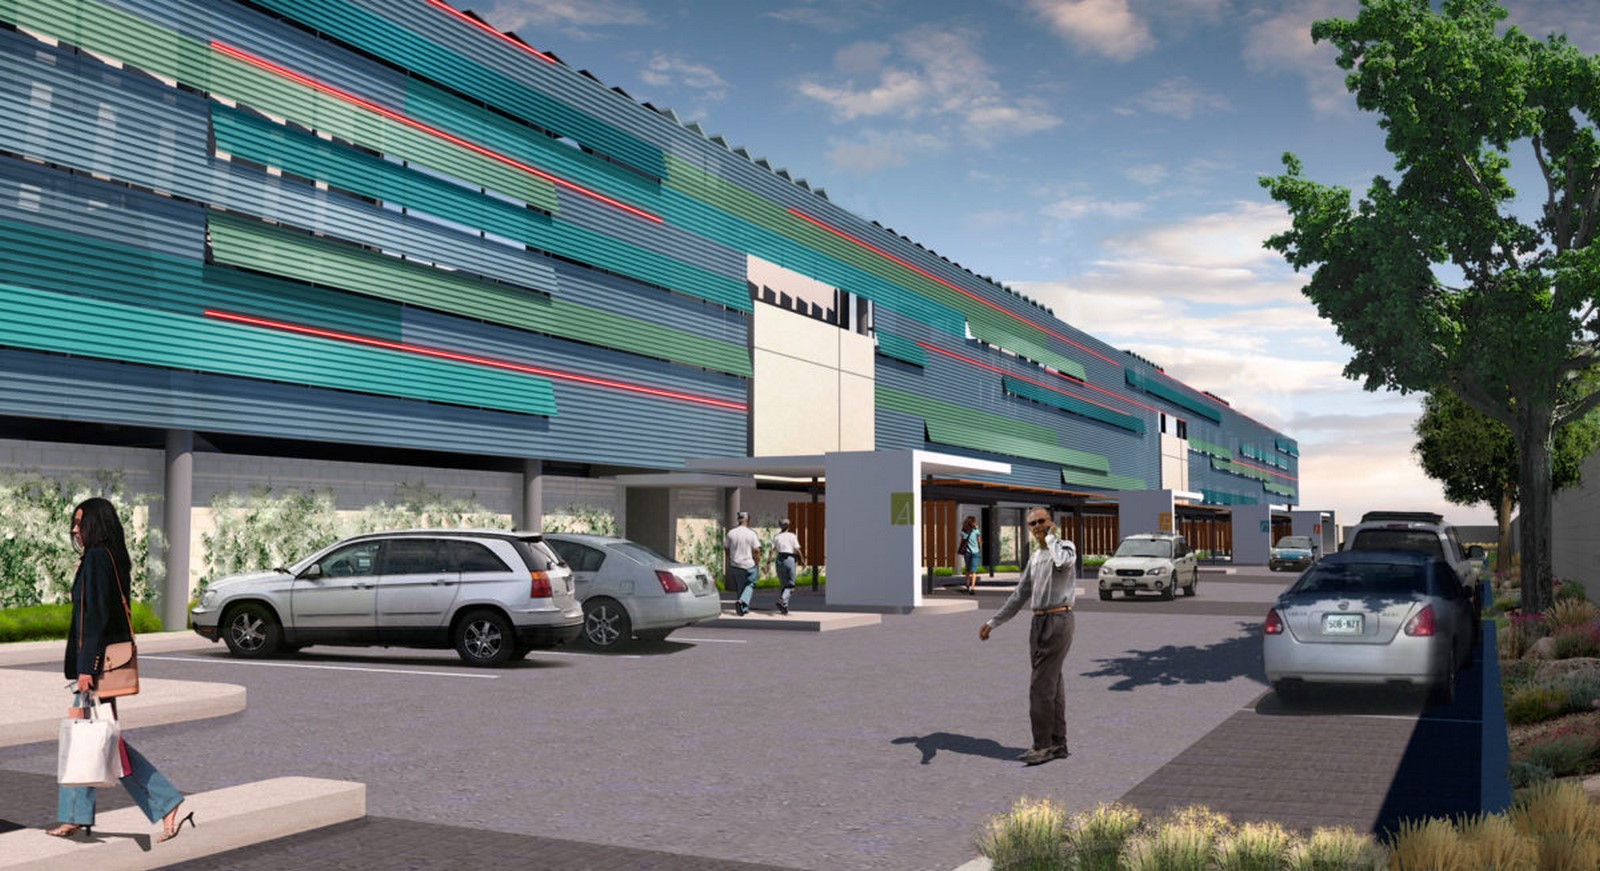 Paisano Green Community Senior Housing by Workshop8: First NetZero, Fossil Fuel Free, LEED Platinum senior housing - Sheet4